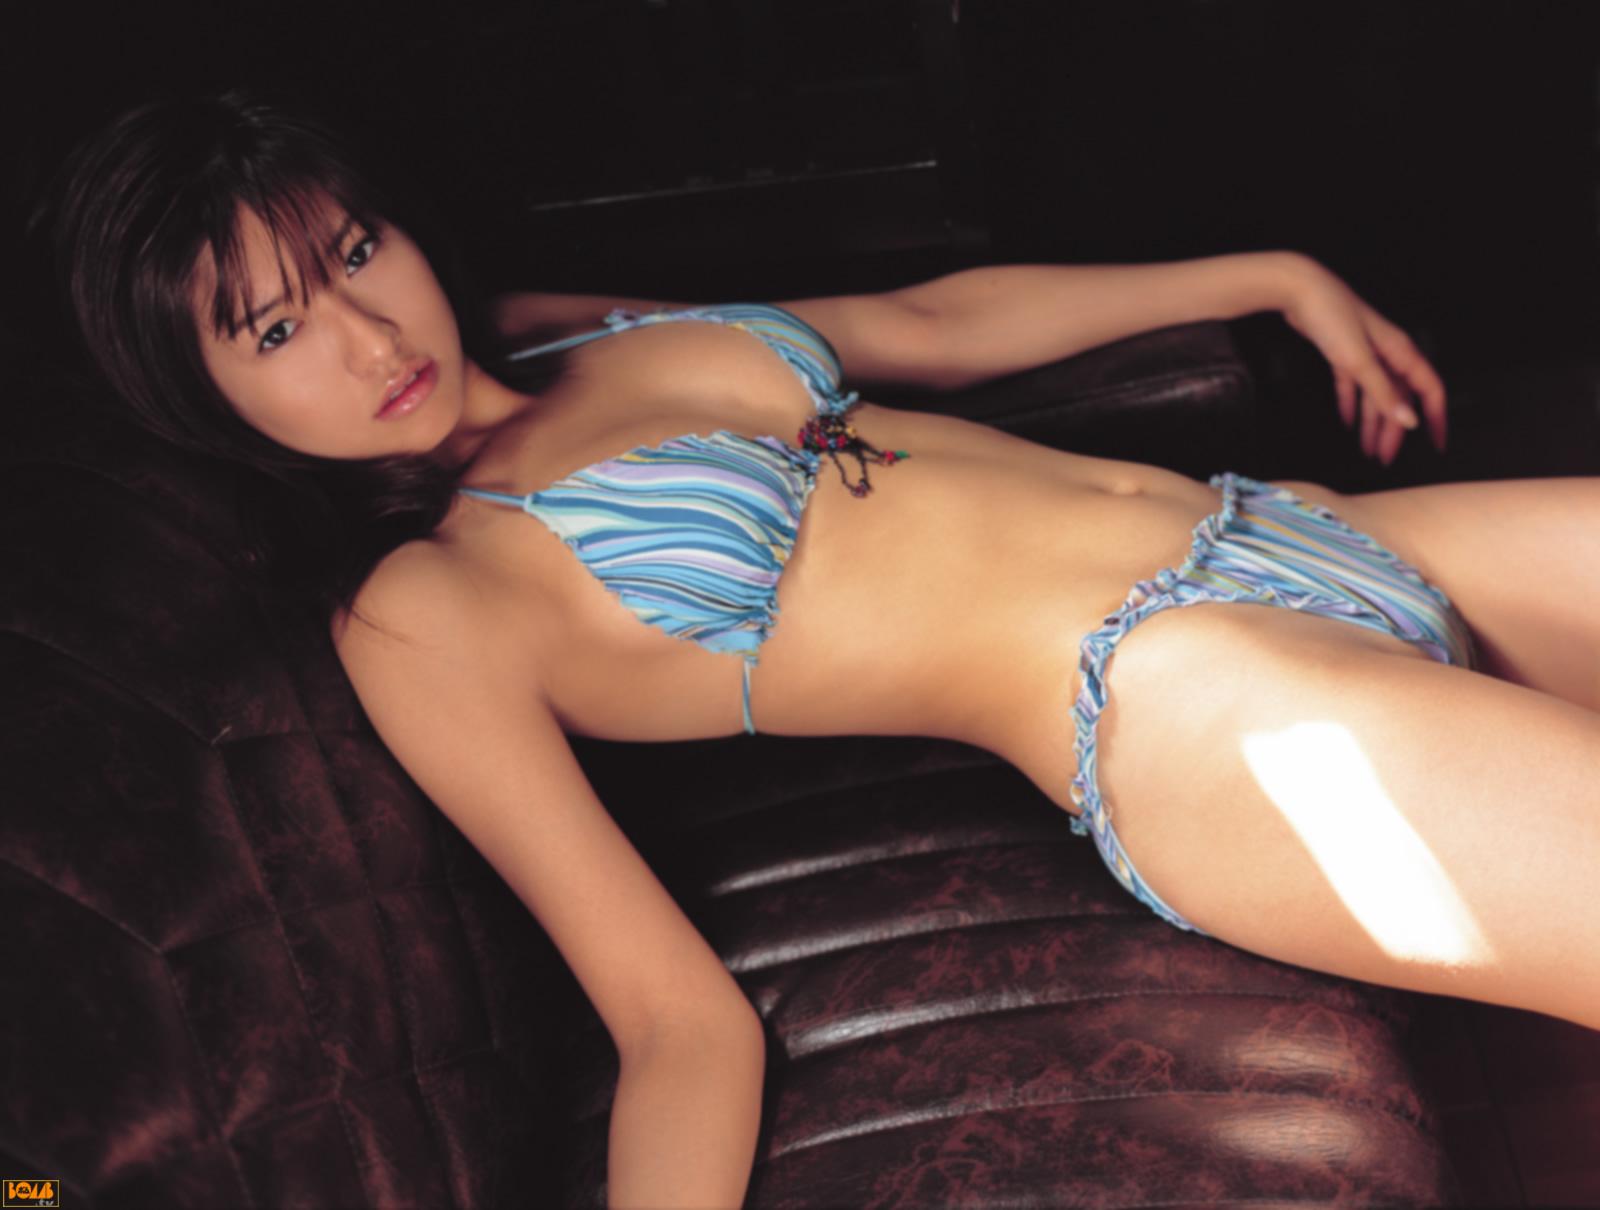 [bomb.tv] 2004 Chisato Morishita 森下千里 (103P)